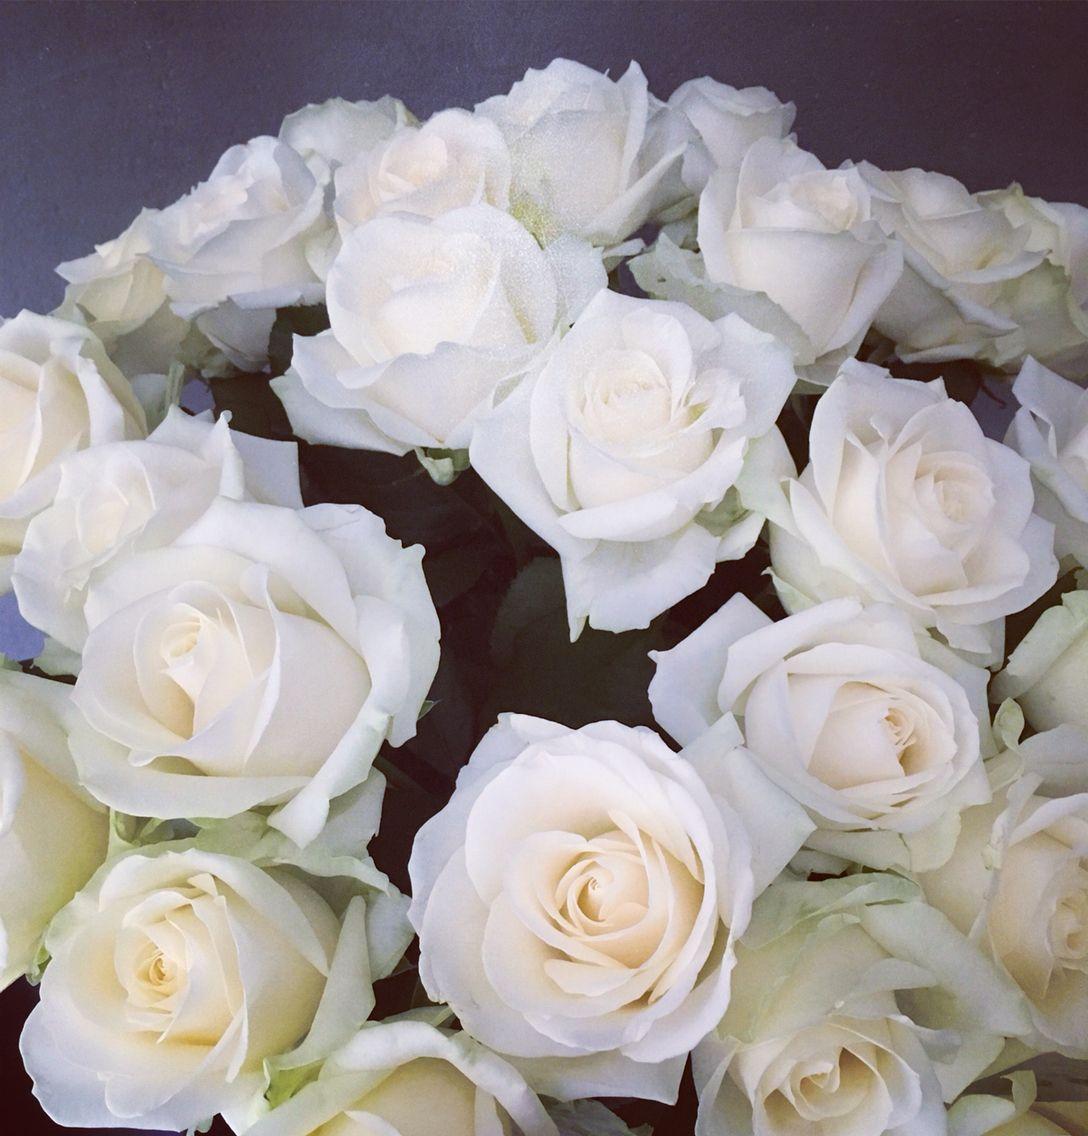 Roses ©kittyvanbarneveld